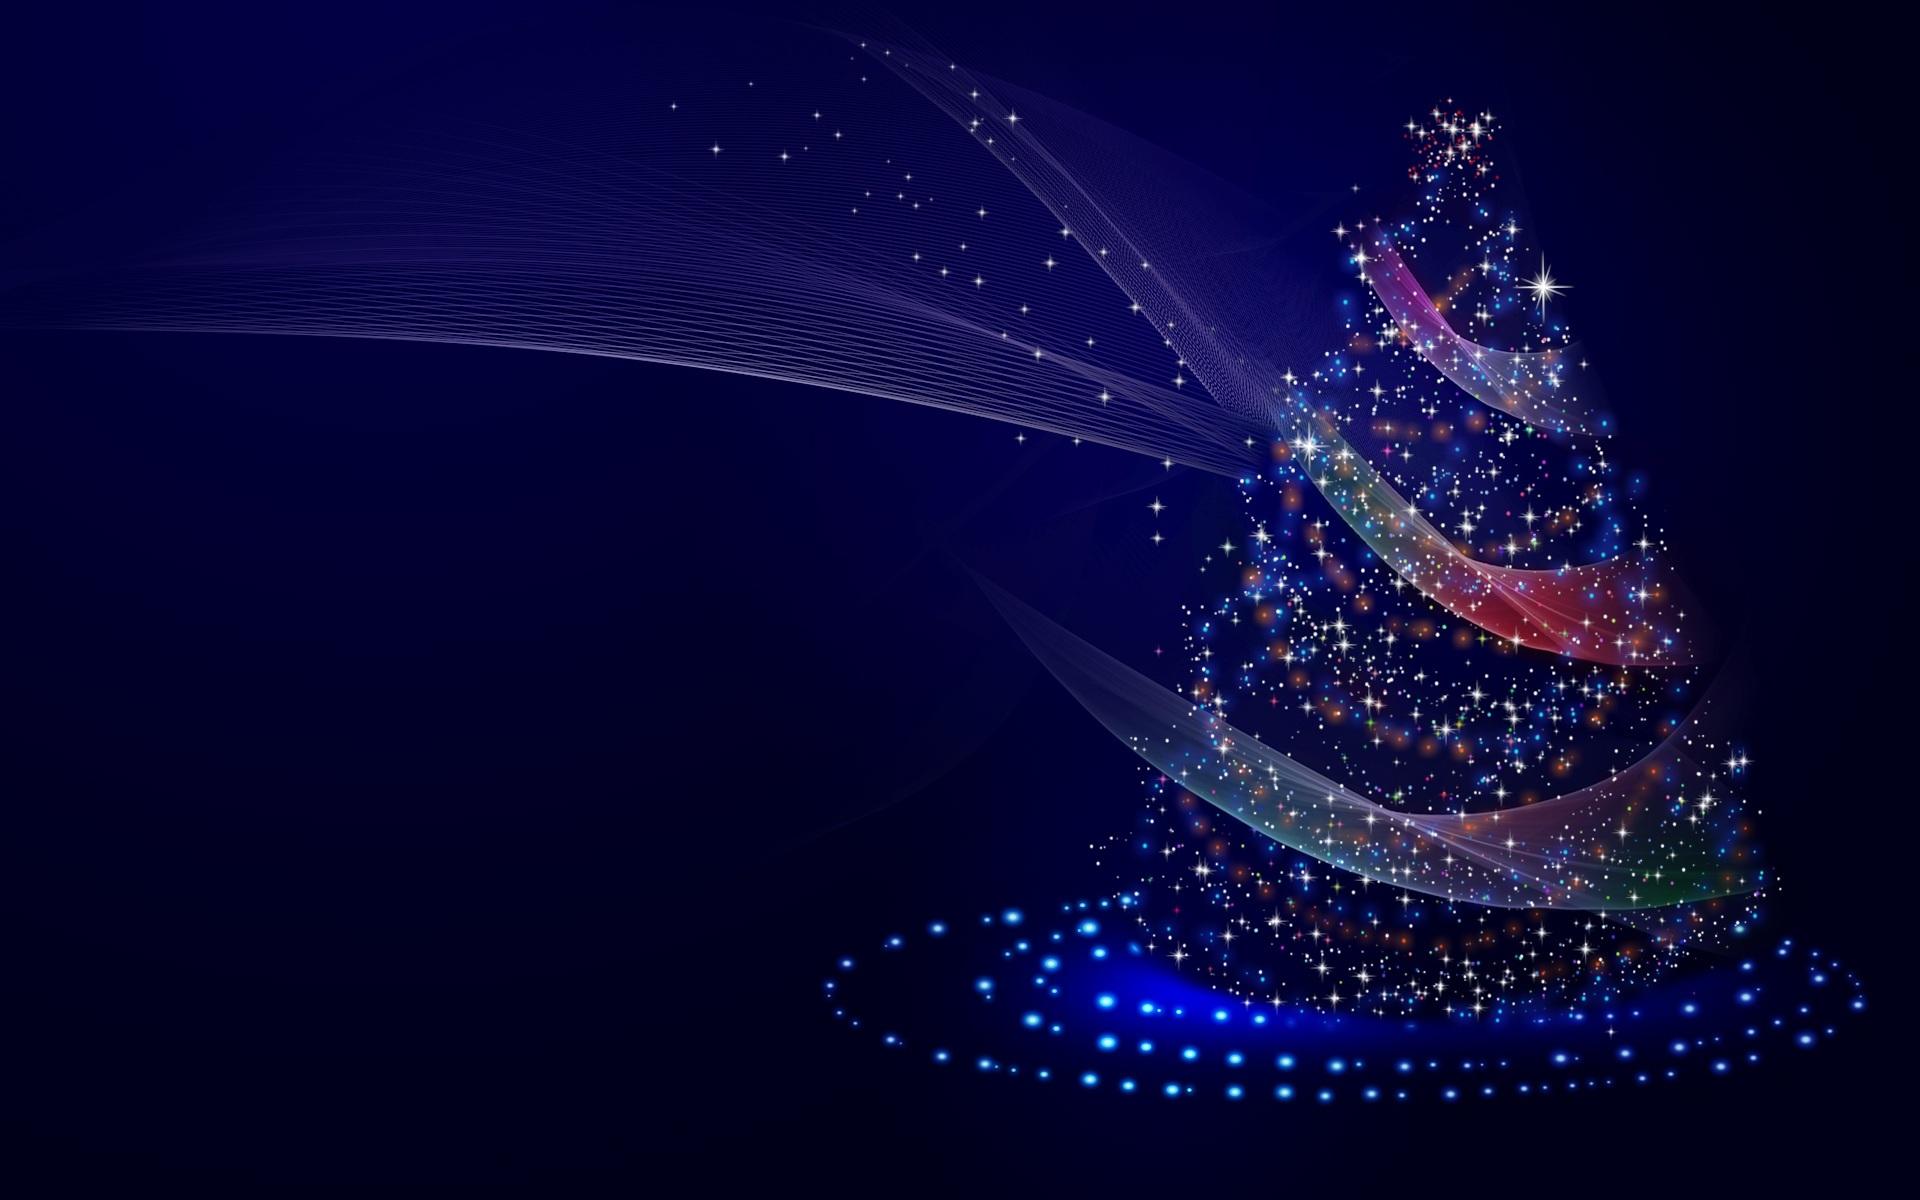 christmas-tree-illustrations-vx.jpg